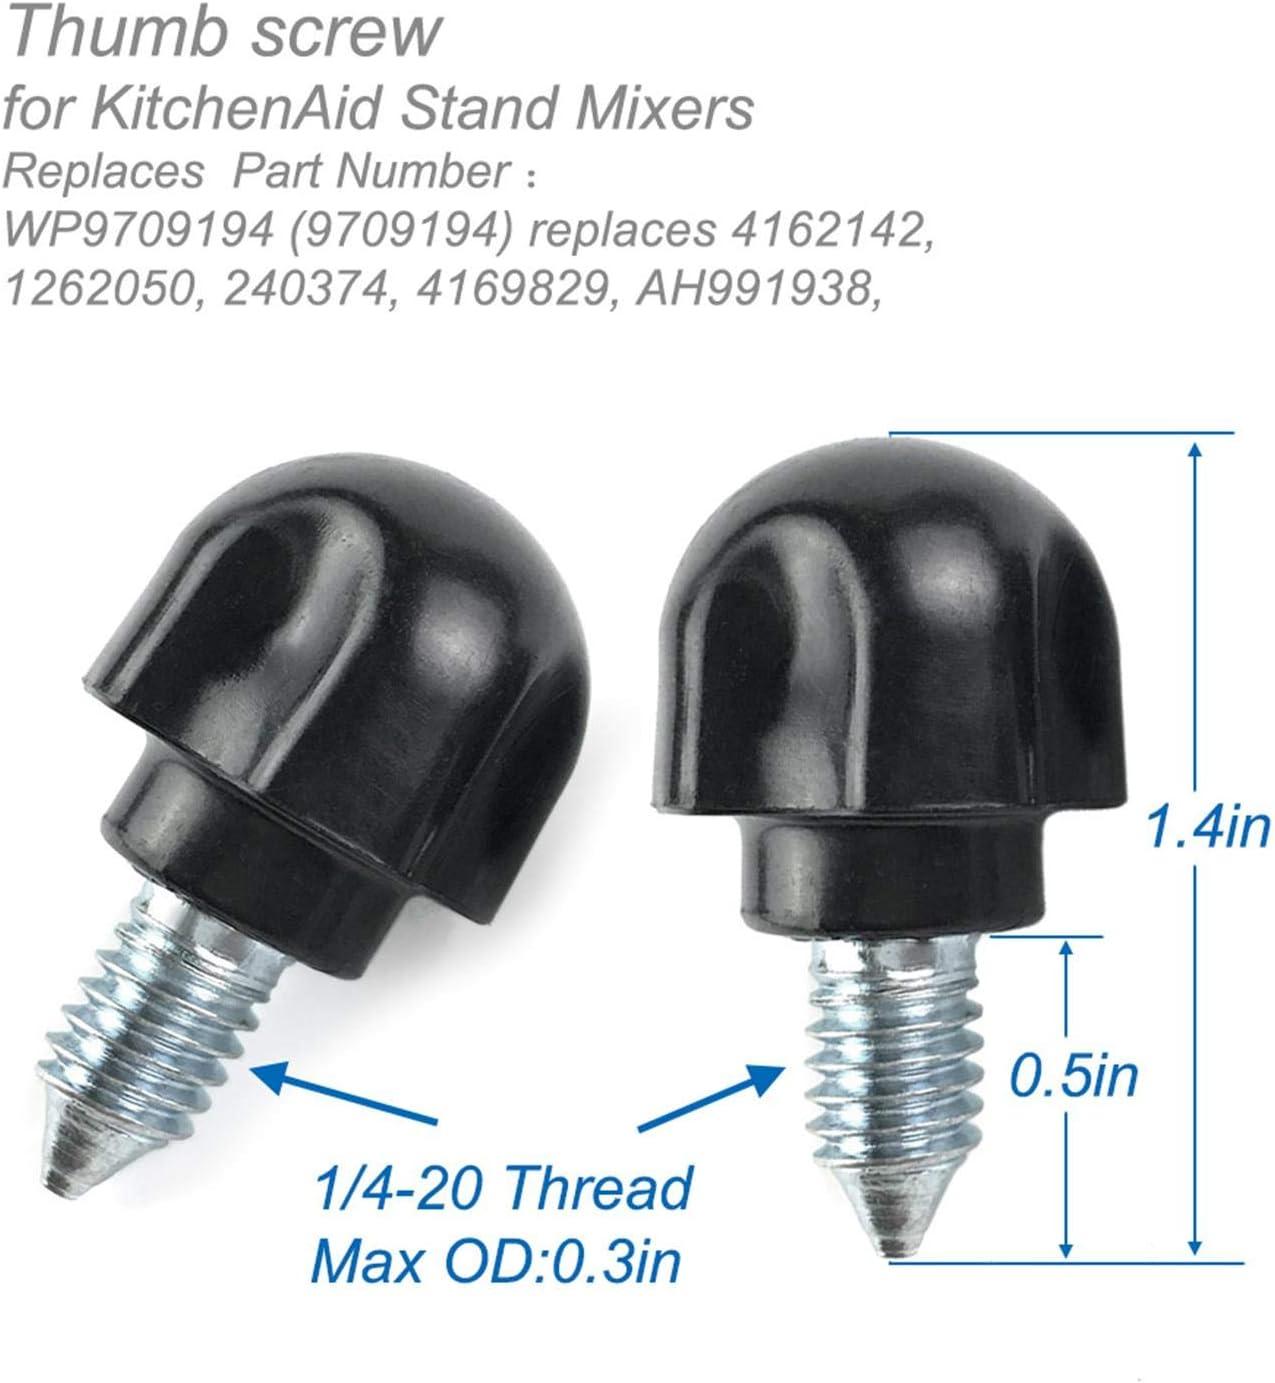 Parafuso de KitchenAid 4159247 3400020 Whirlpool Mixer Parafuso 4159214